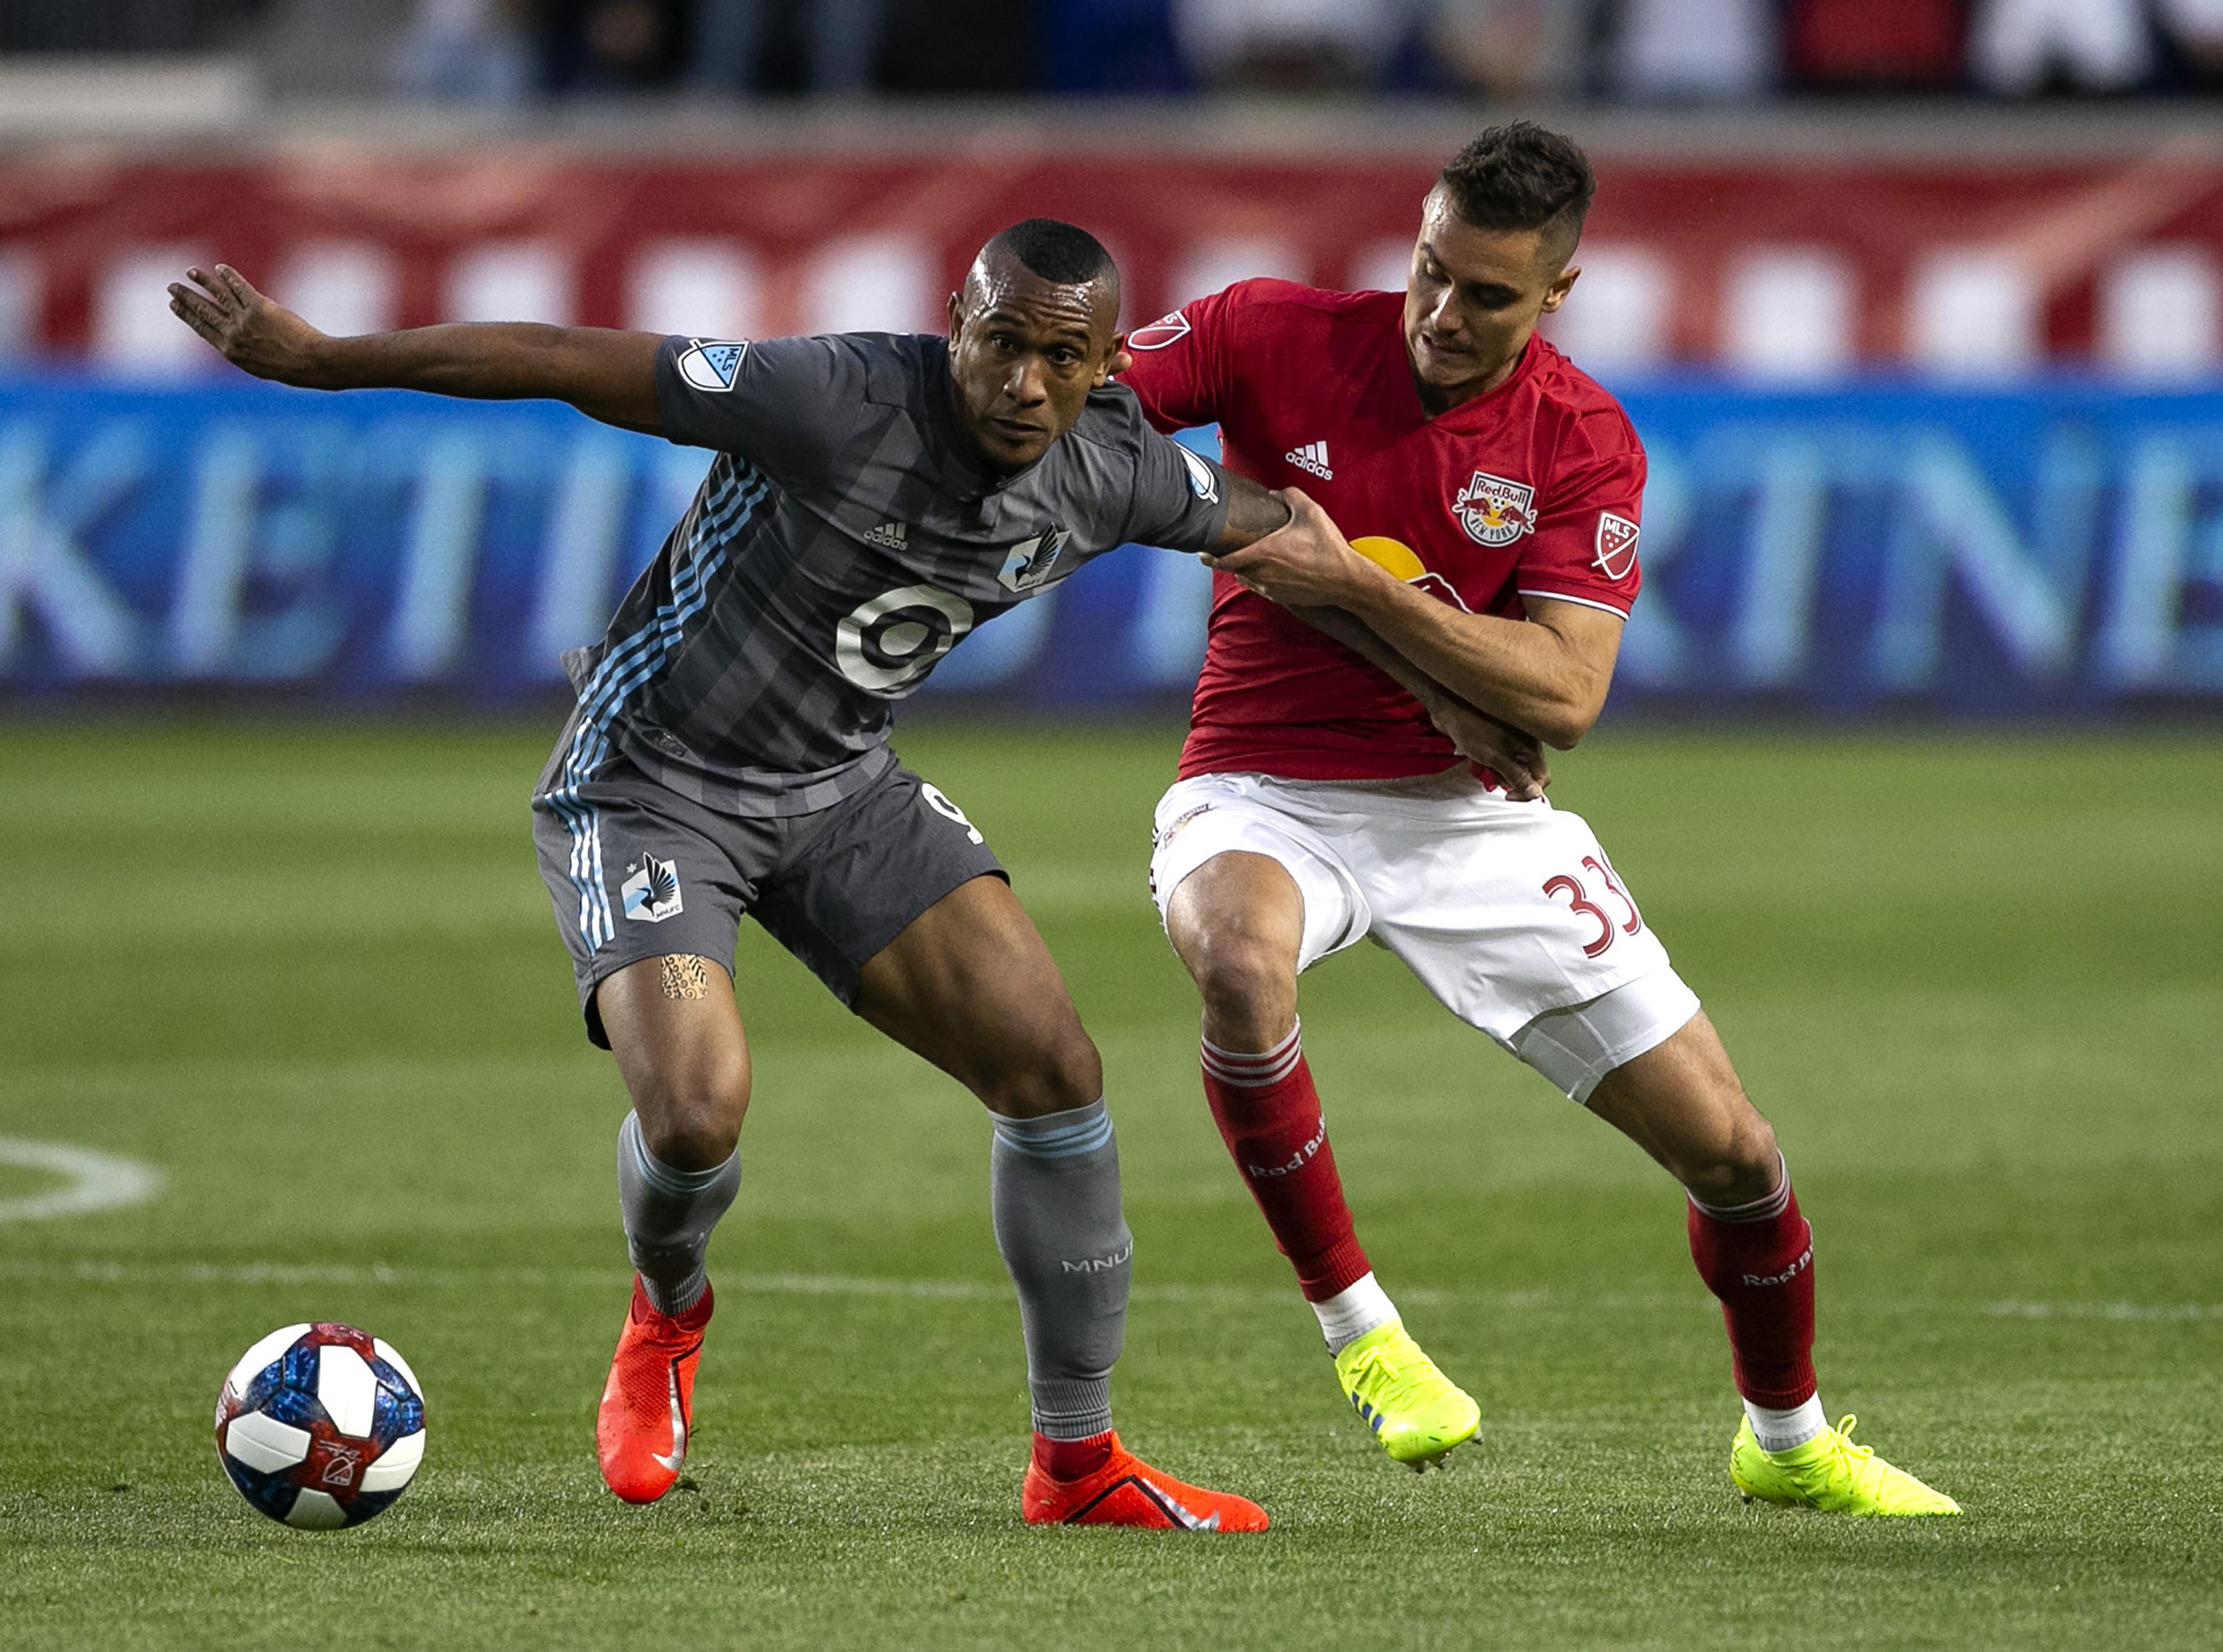 MLS: Minnesota United FC at New York Red Bulls